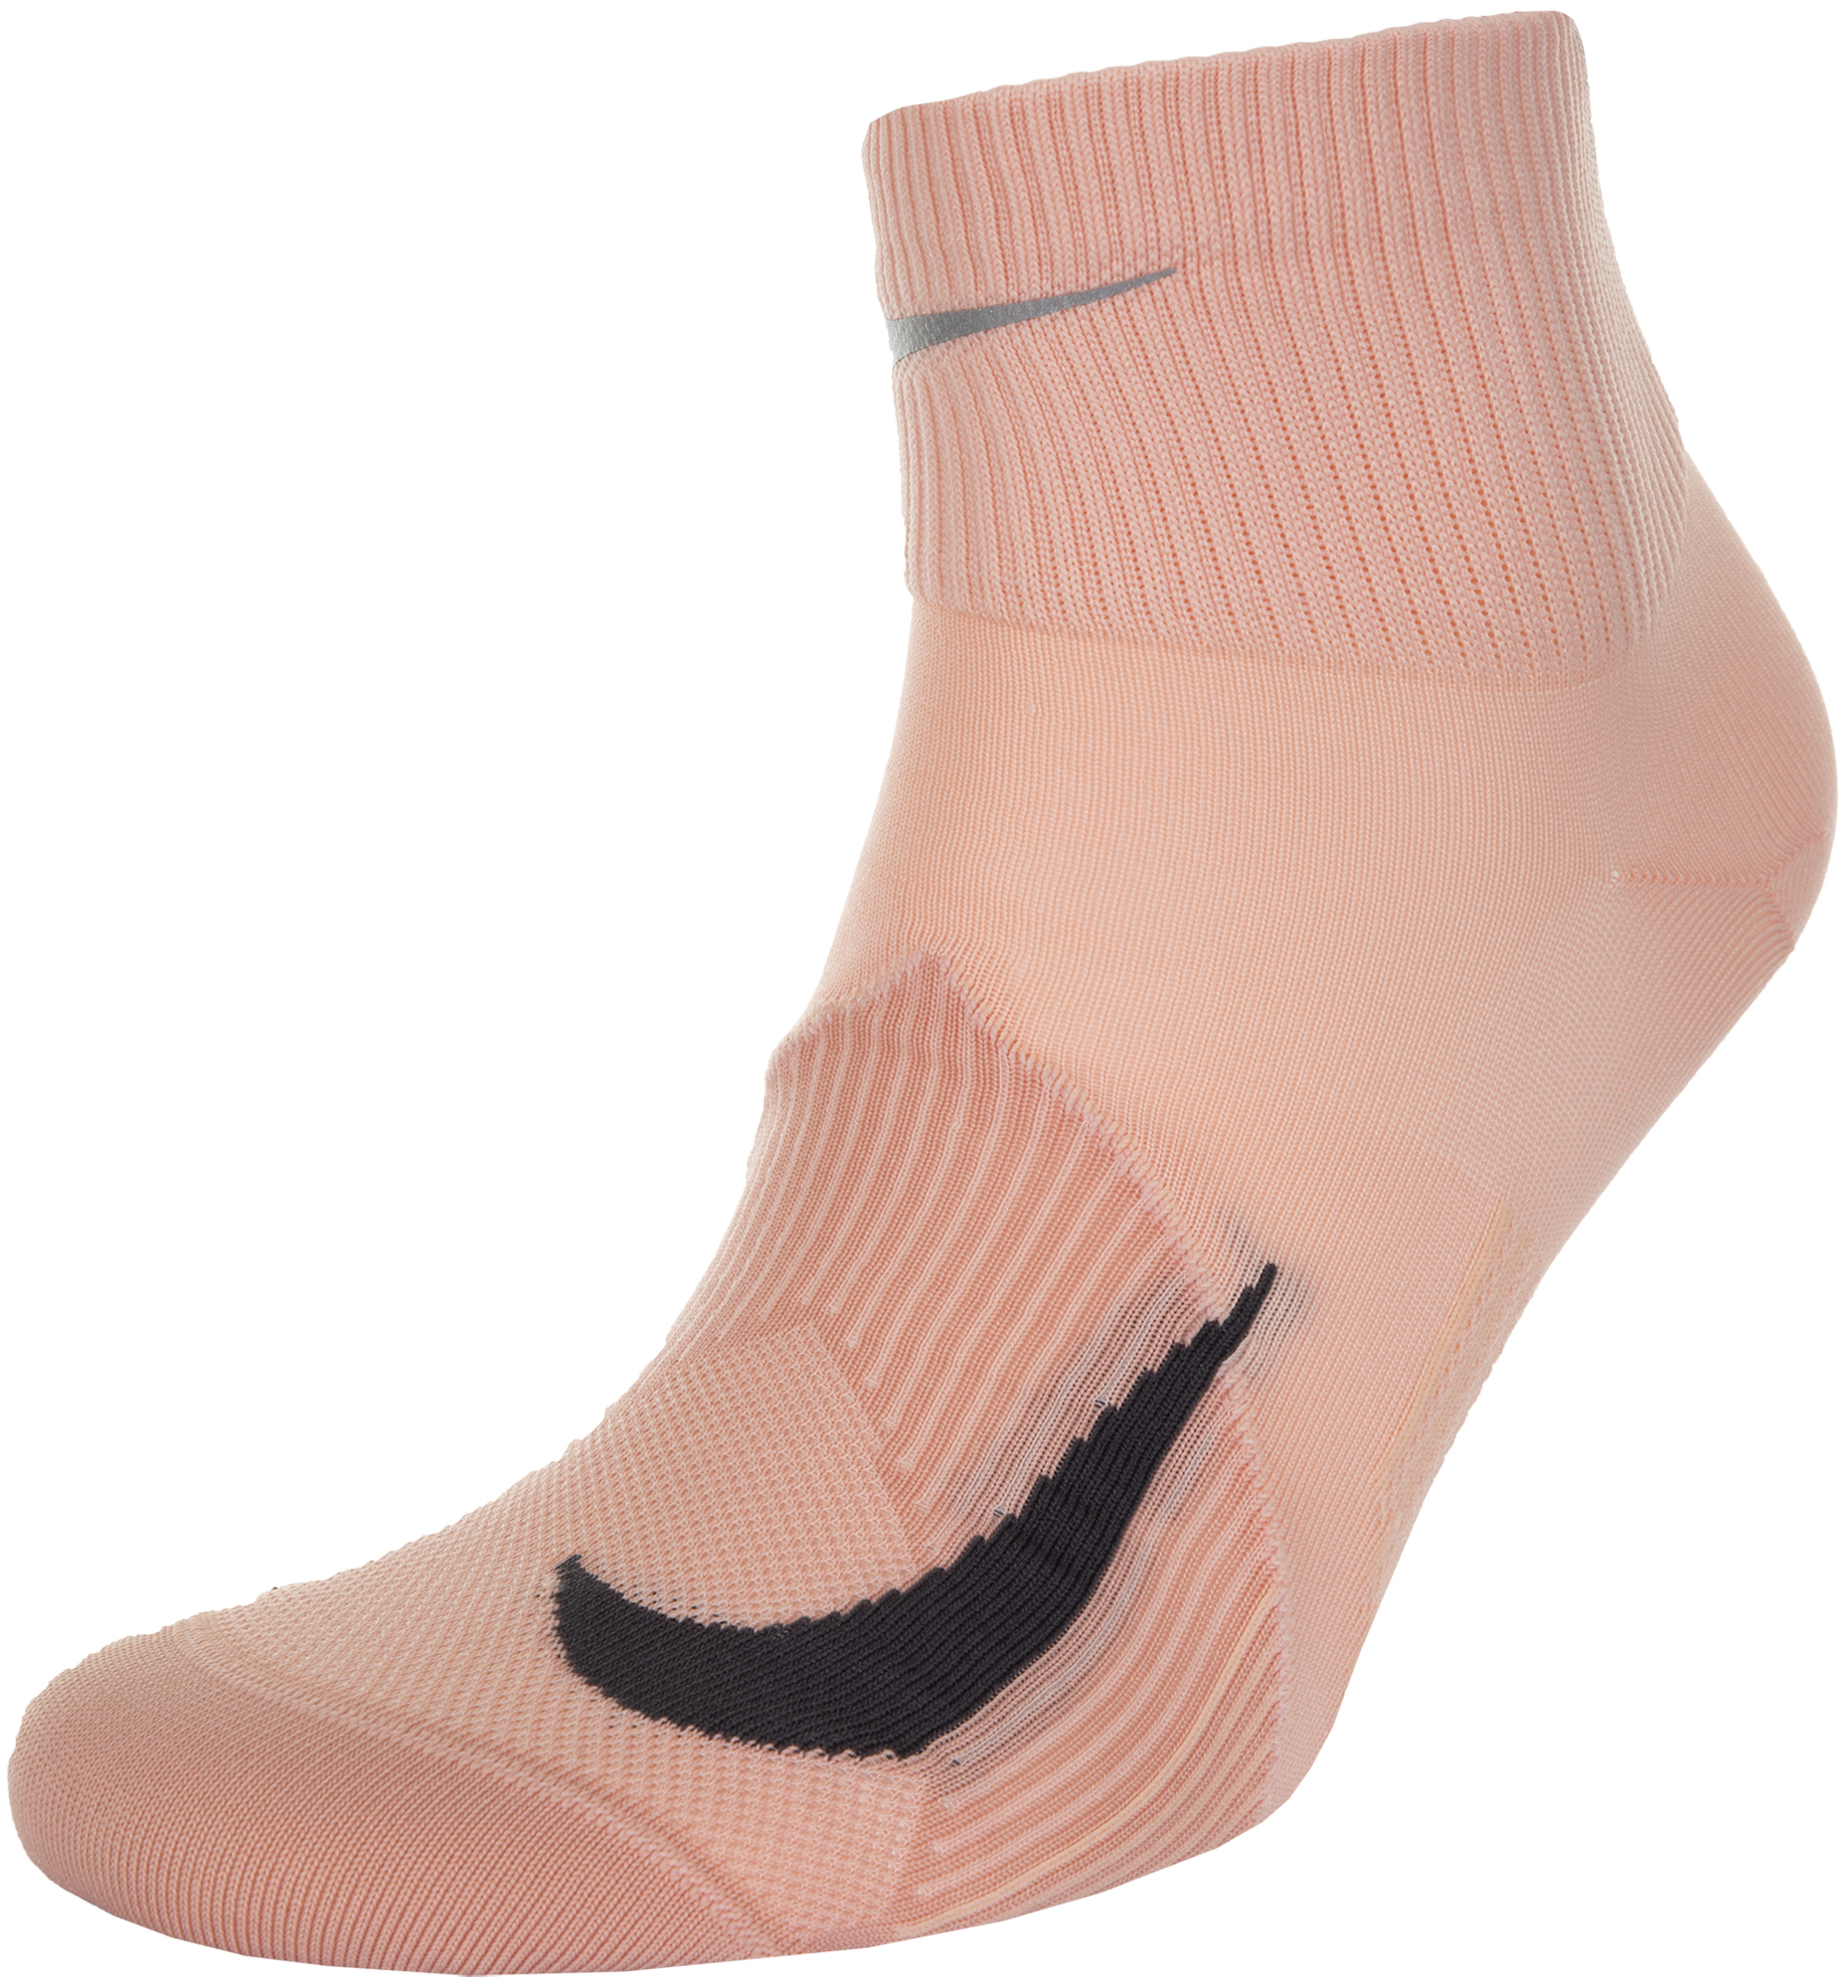 Nike Носки женские Elite Lightweight, размер 40-42